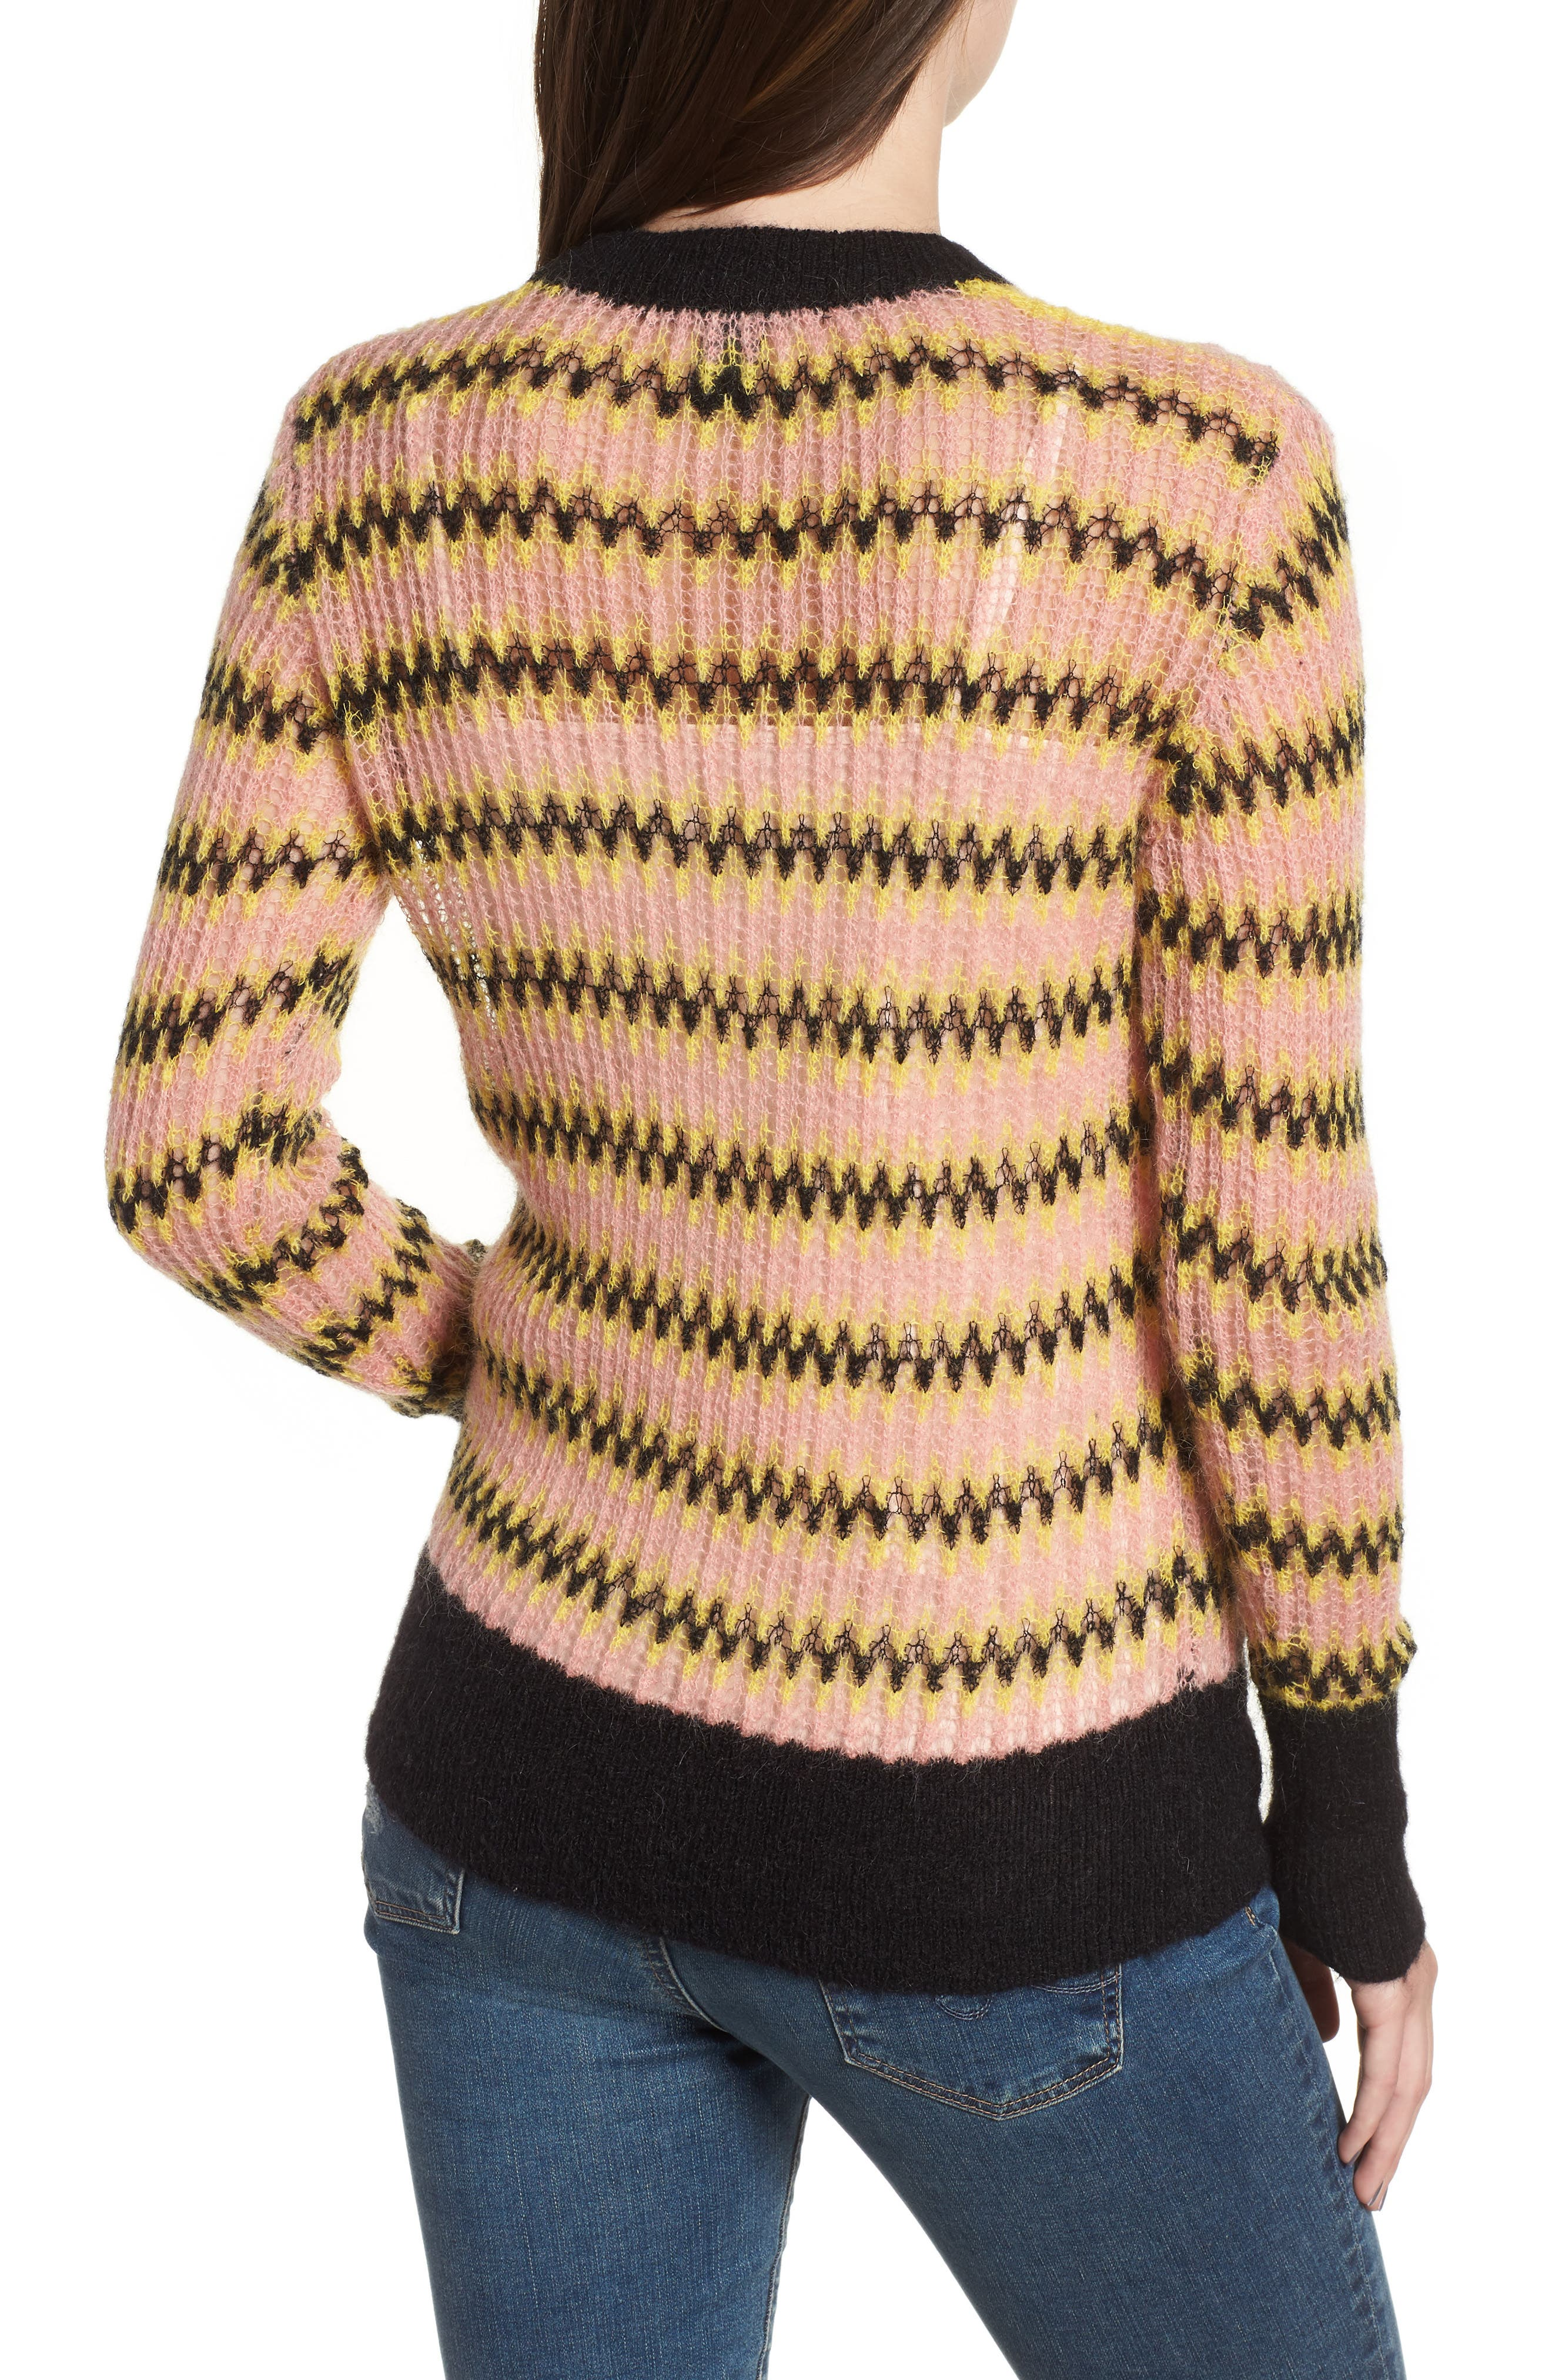 Zig Zag Wool Blend Sweater,                             Alternate thumbnail 2, color,                             MULTI PINK YELLOW ZIGZAG PRINT